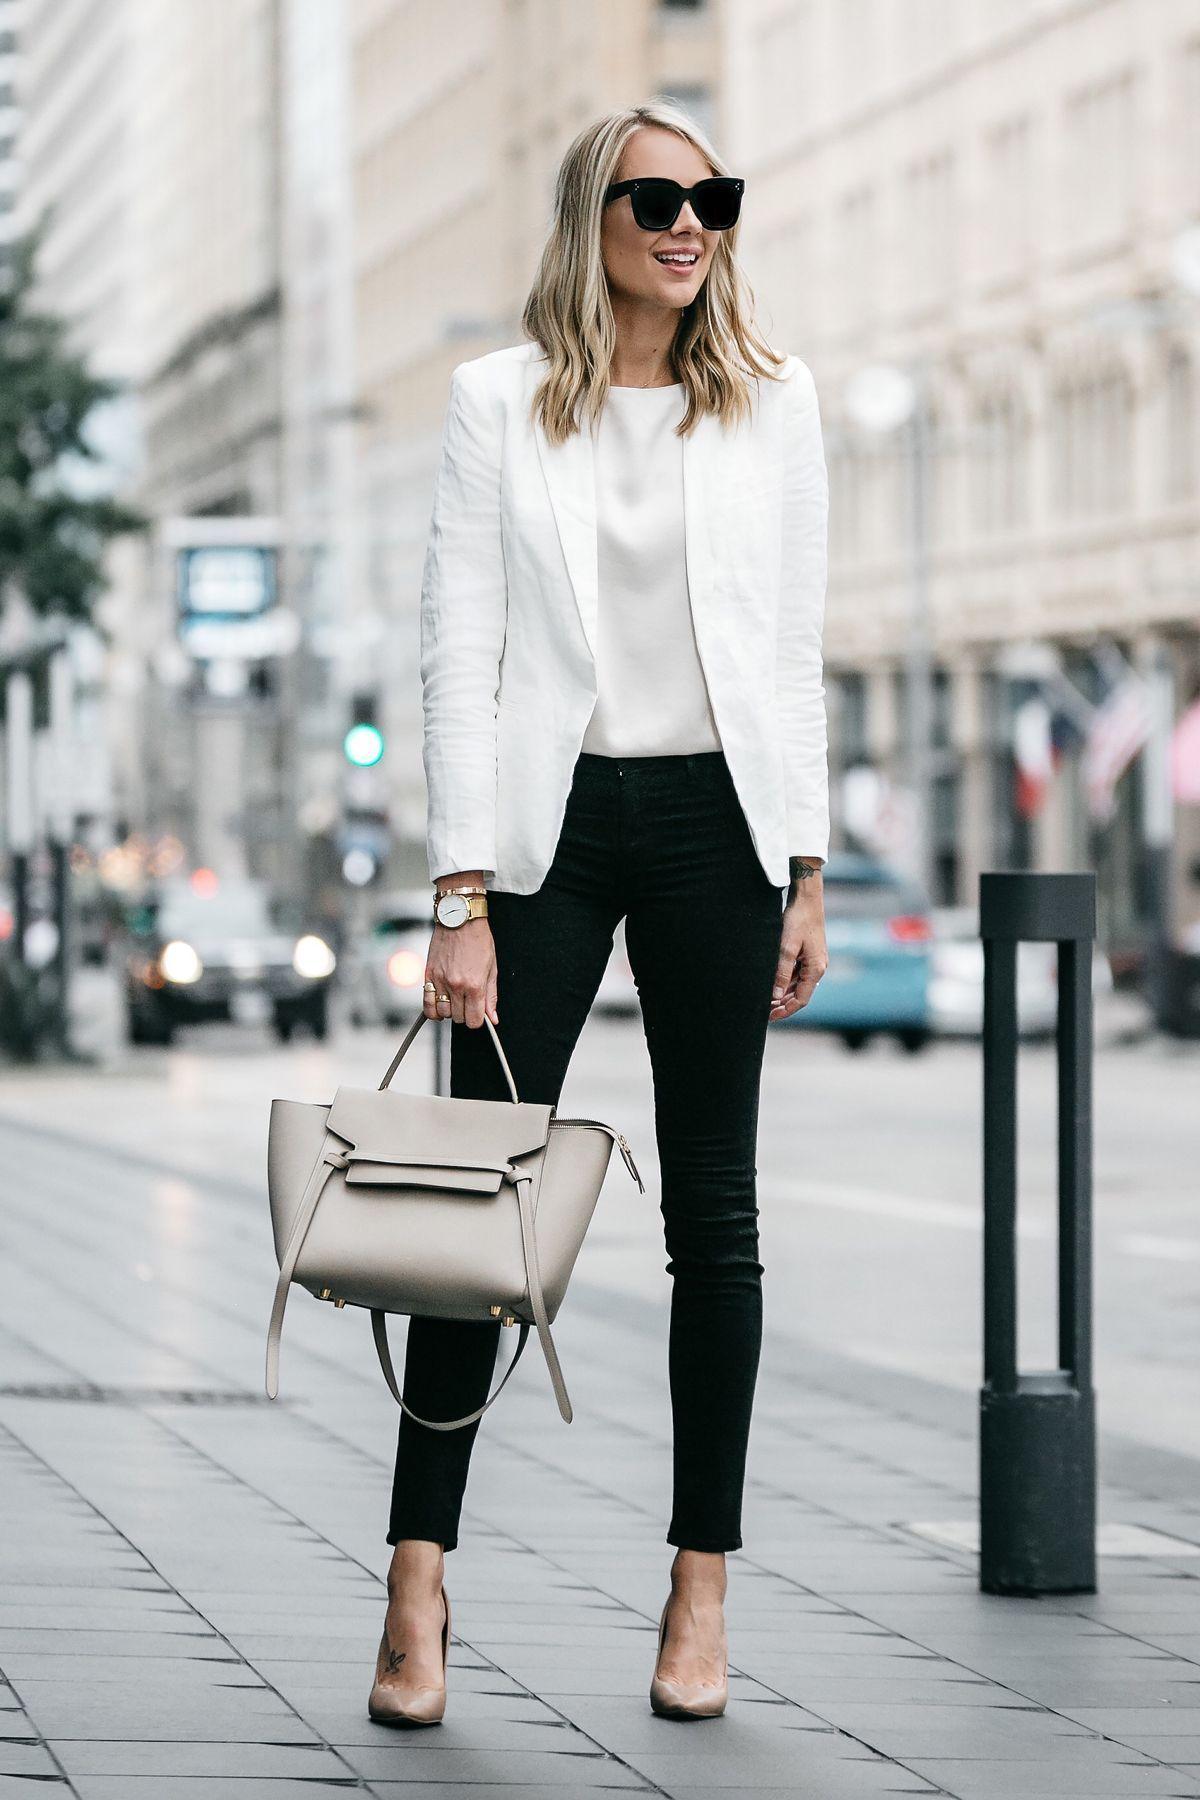 Ropa para mujer joven elegante